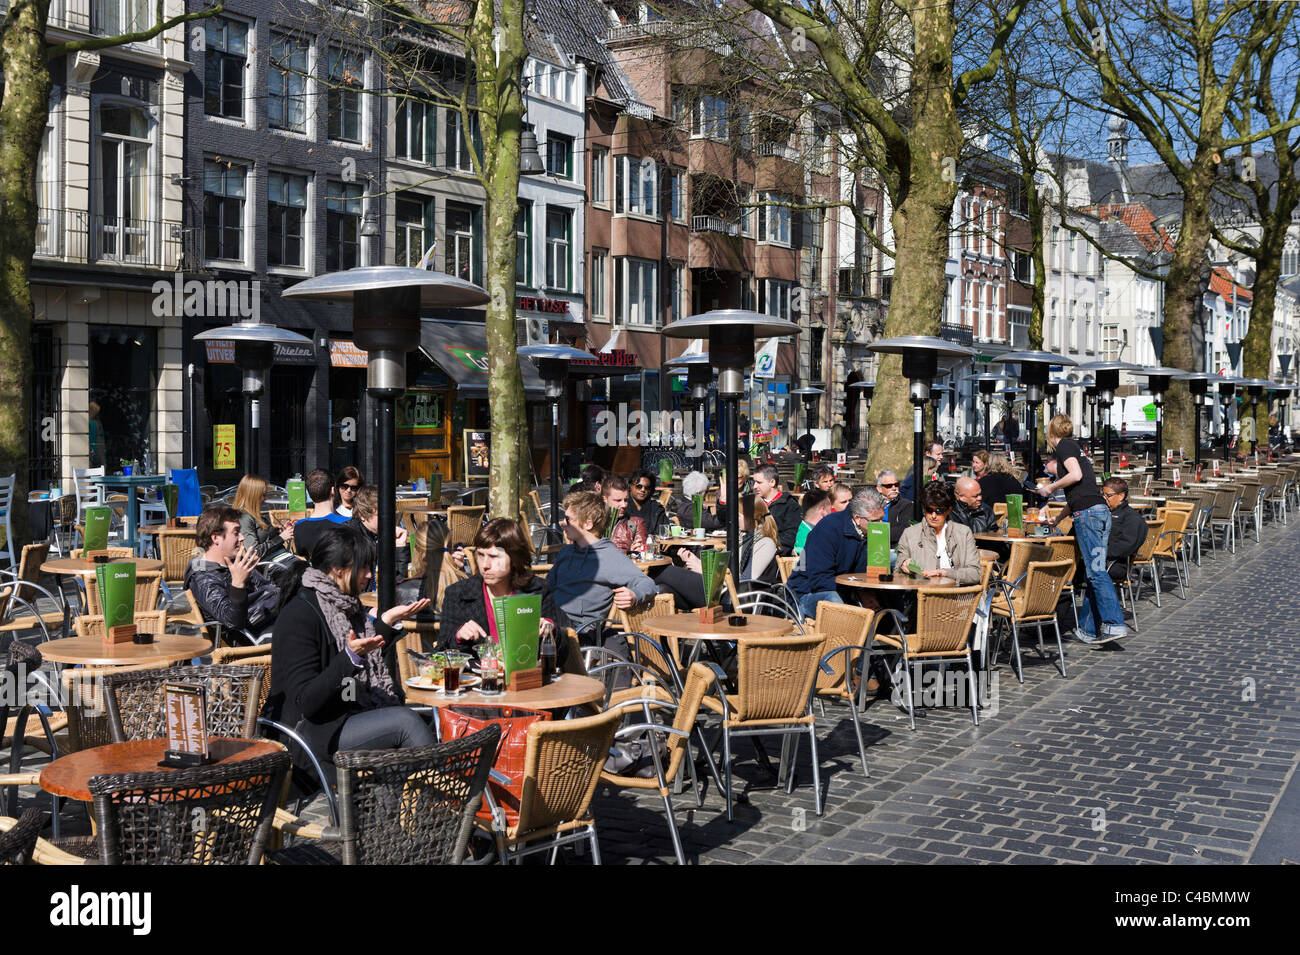 Sidewalk cafe in the Grote Markt (Main Square), Breda, Netherlands Stock Photo